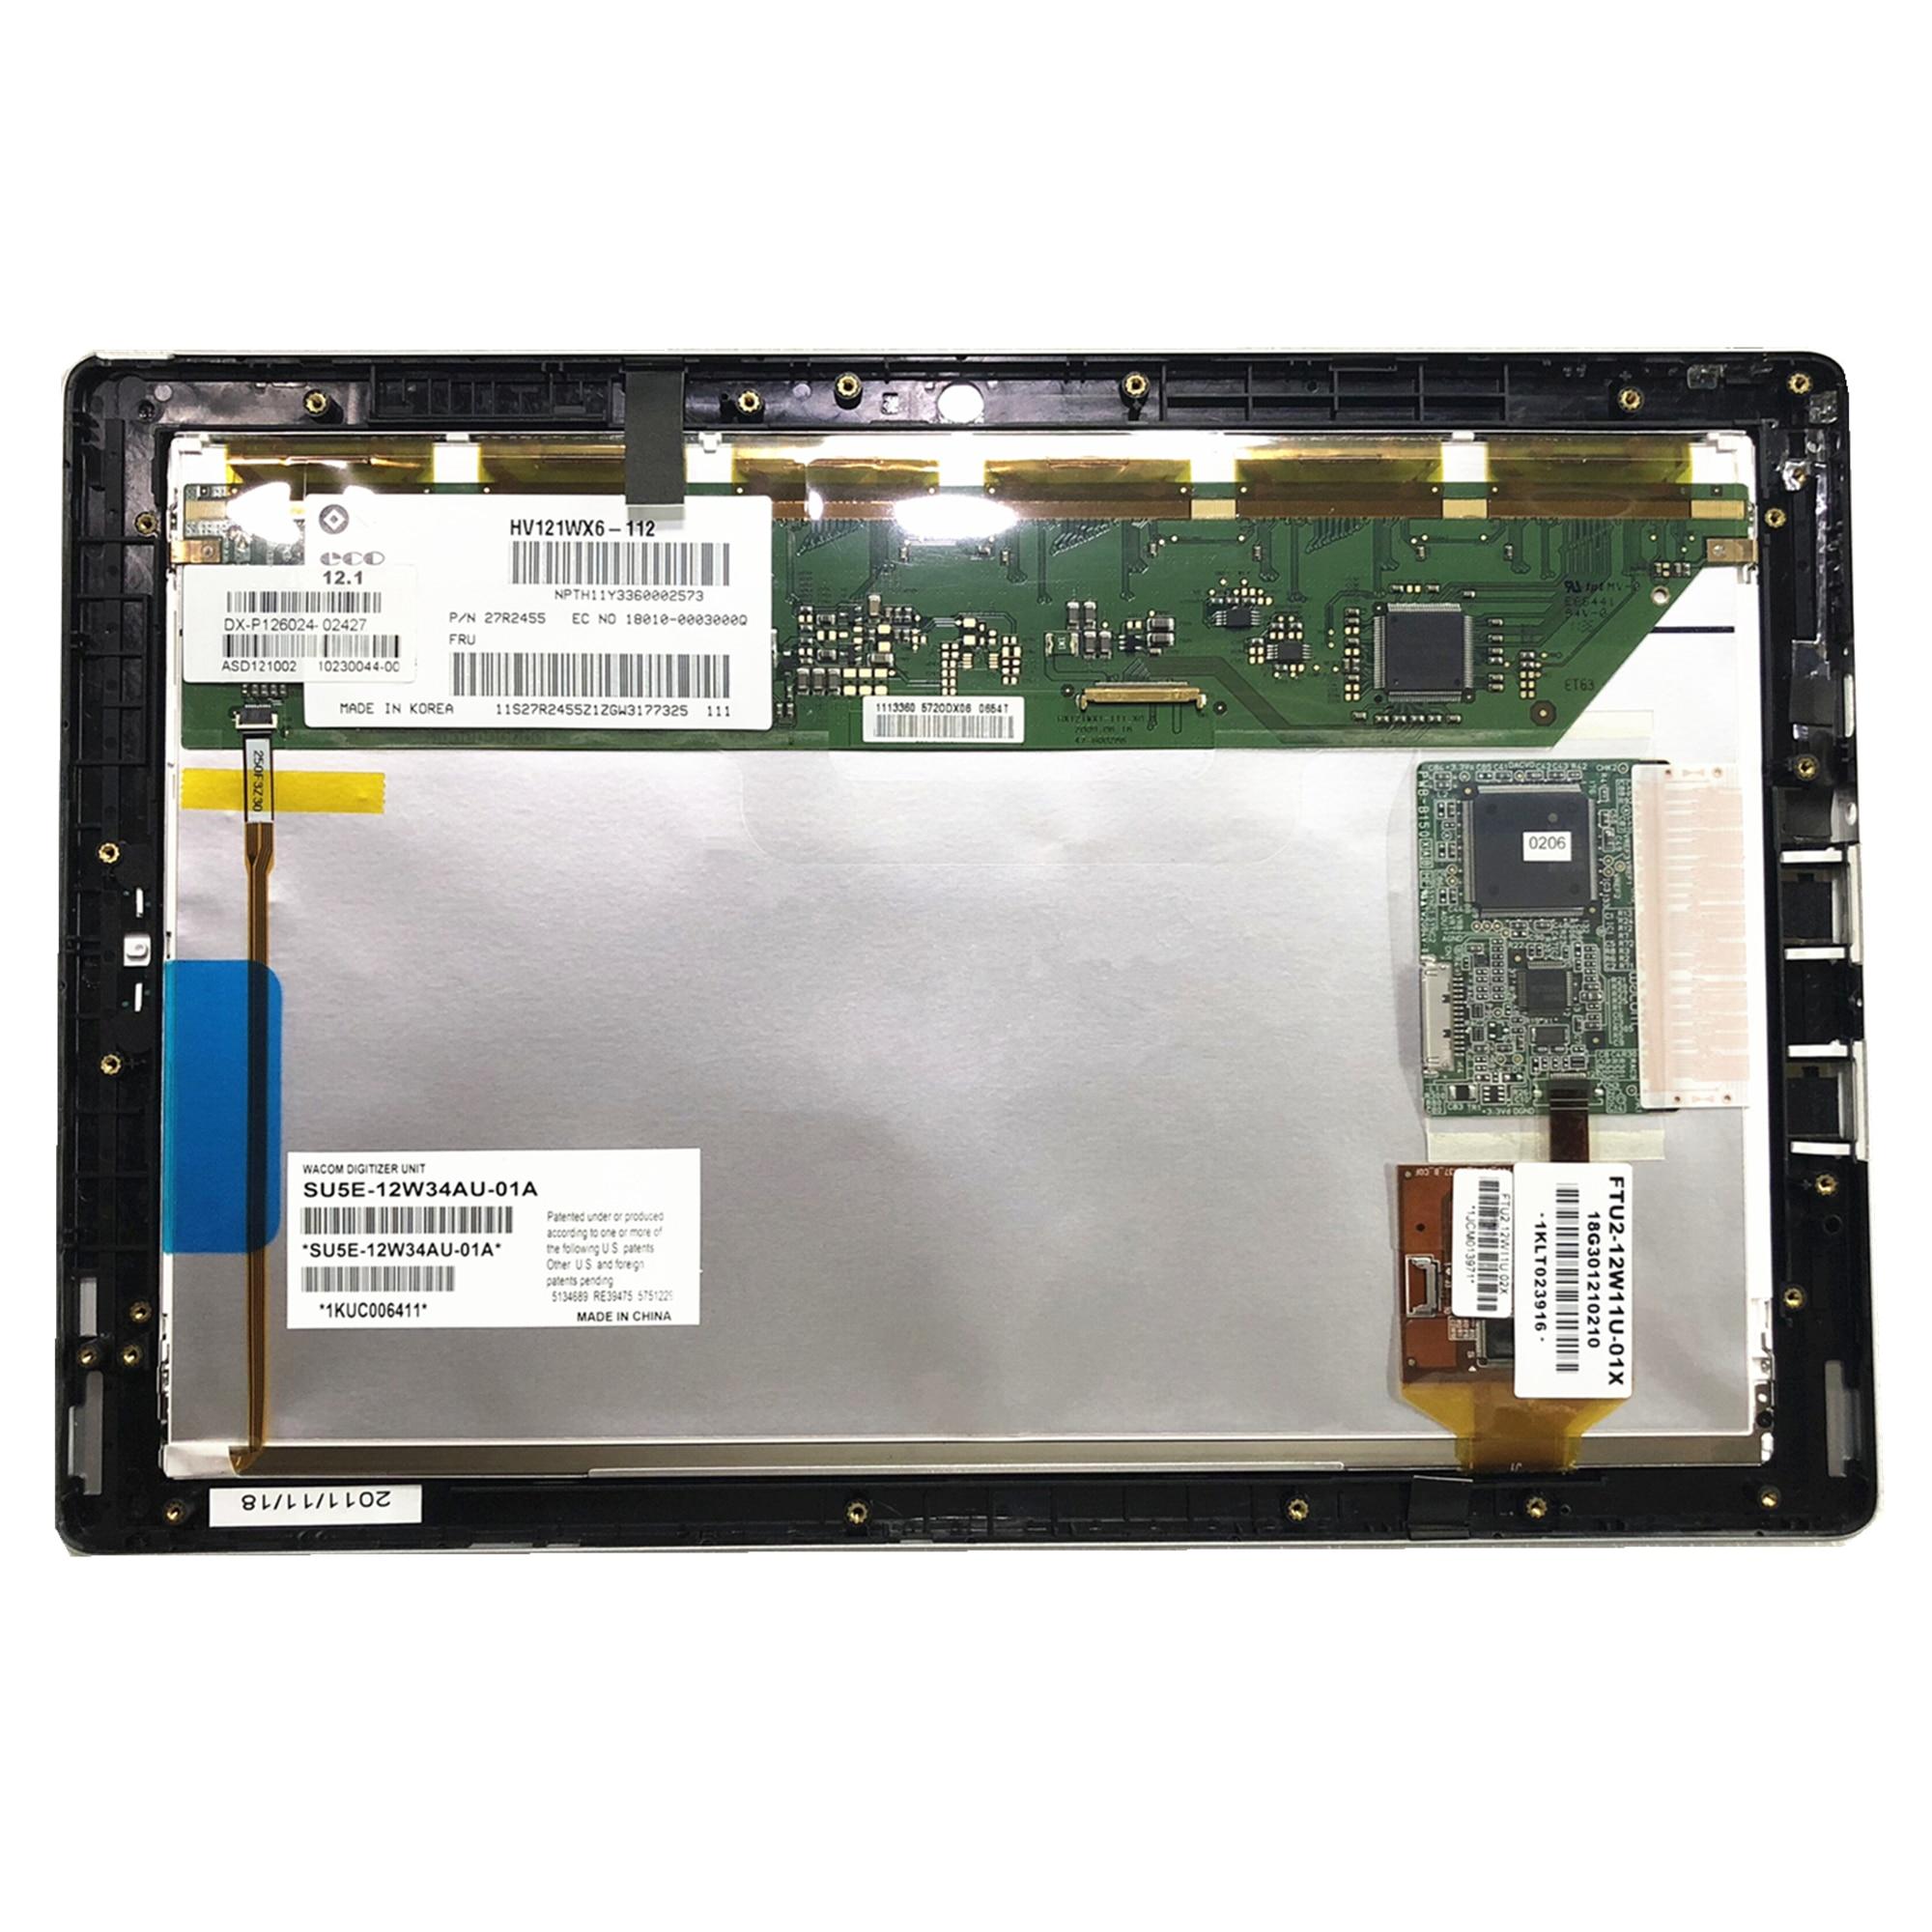 Envío Gratis HV121WX6-112 portátil Lcd pantalla para Asus Eee pizarra EP121 digitalizador de pantalla táctil LCD ASAMBLEA DE